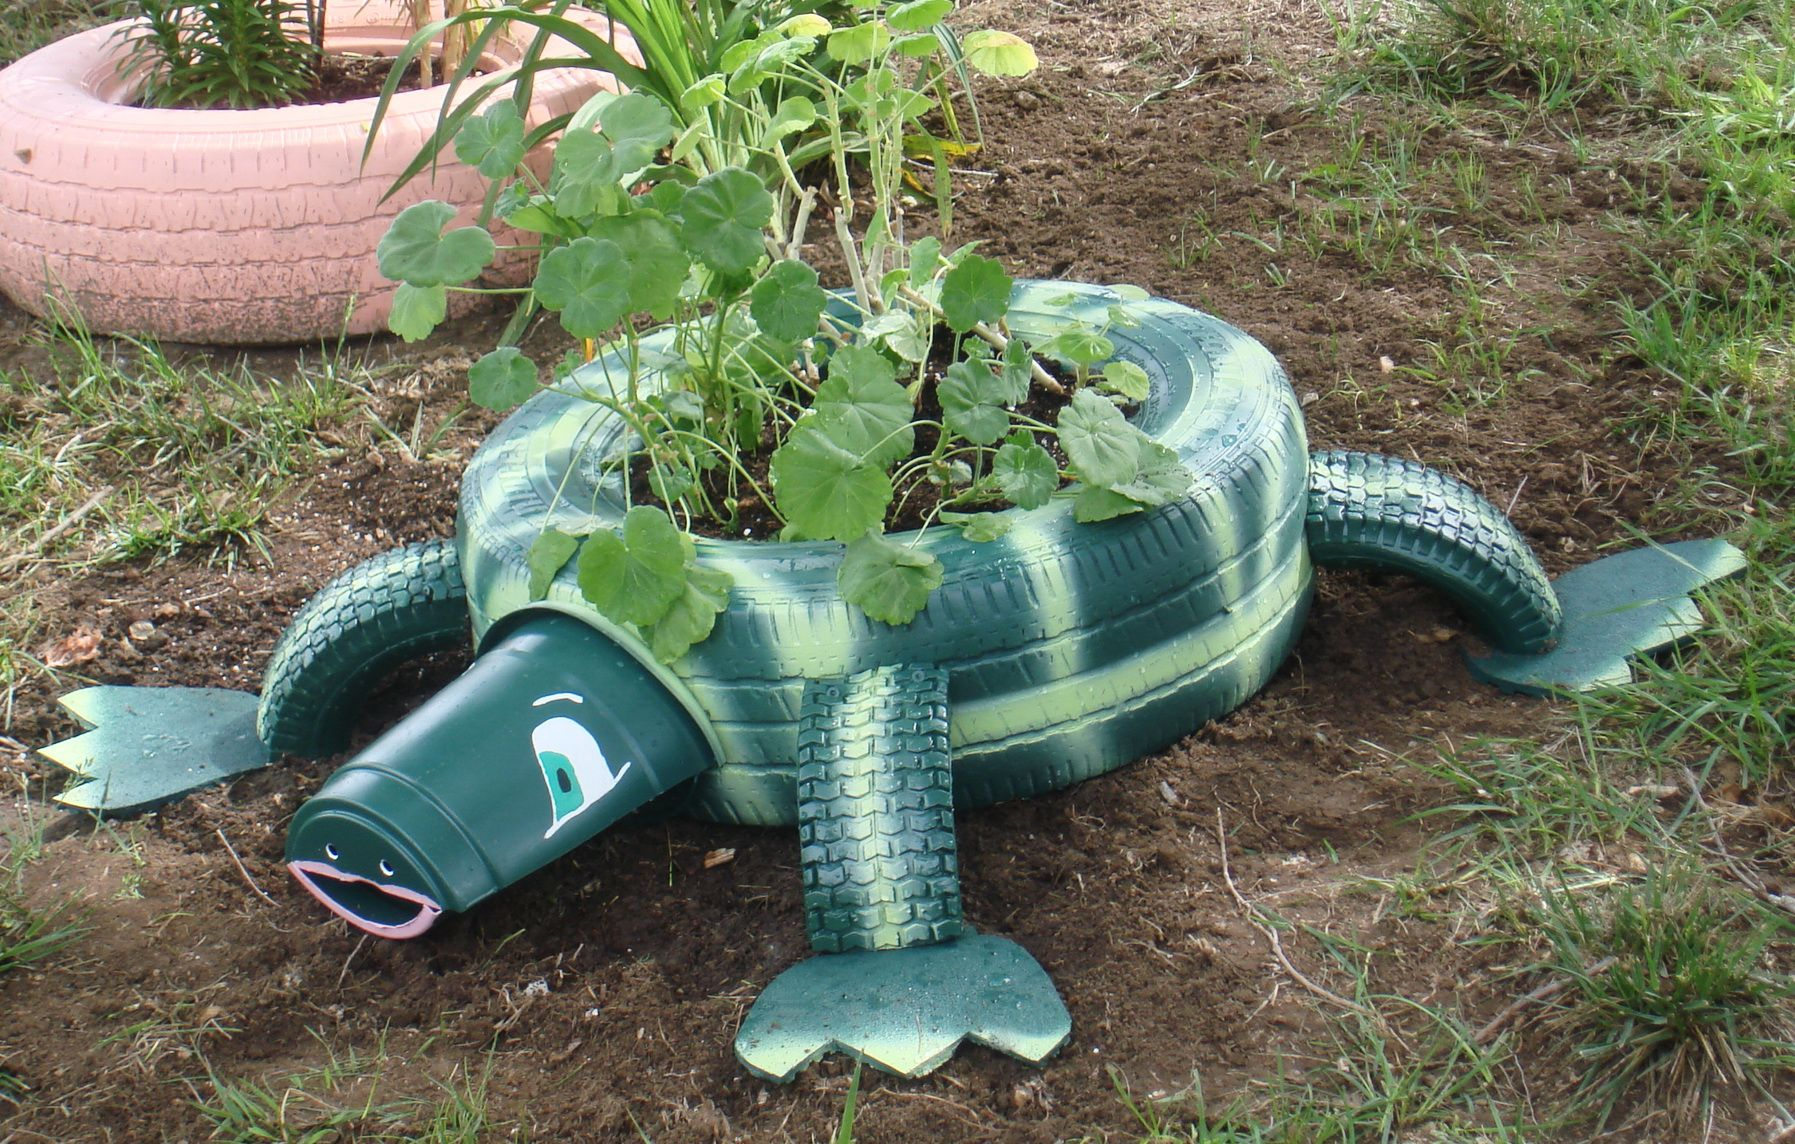 June 6 2014 Treadley The Turtle Made Of Car Tire Wheelbarrow